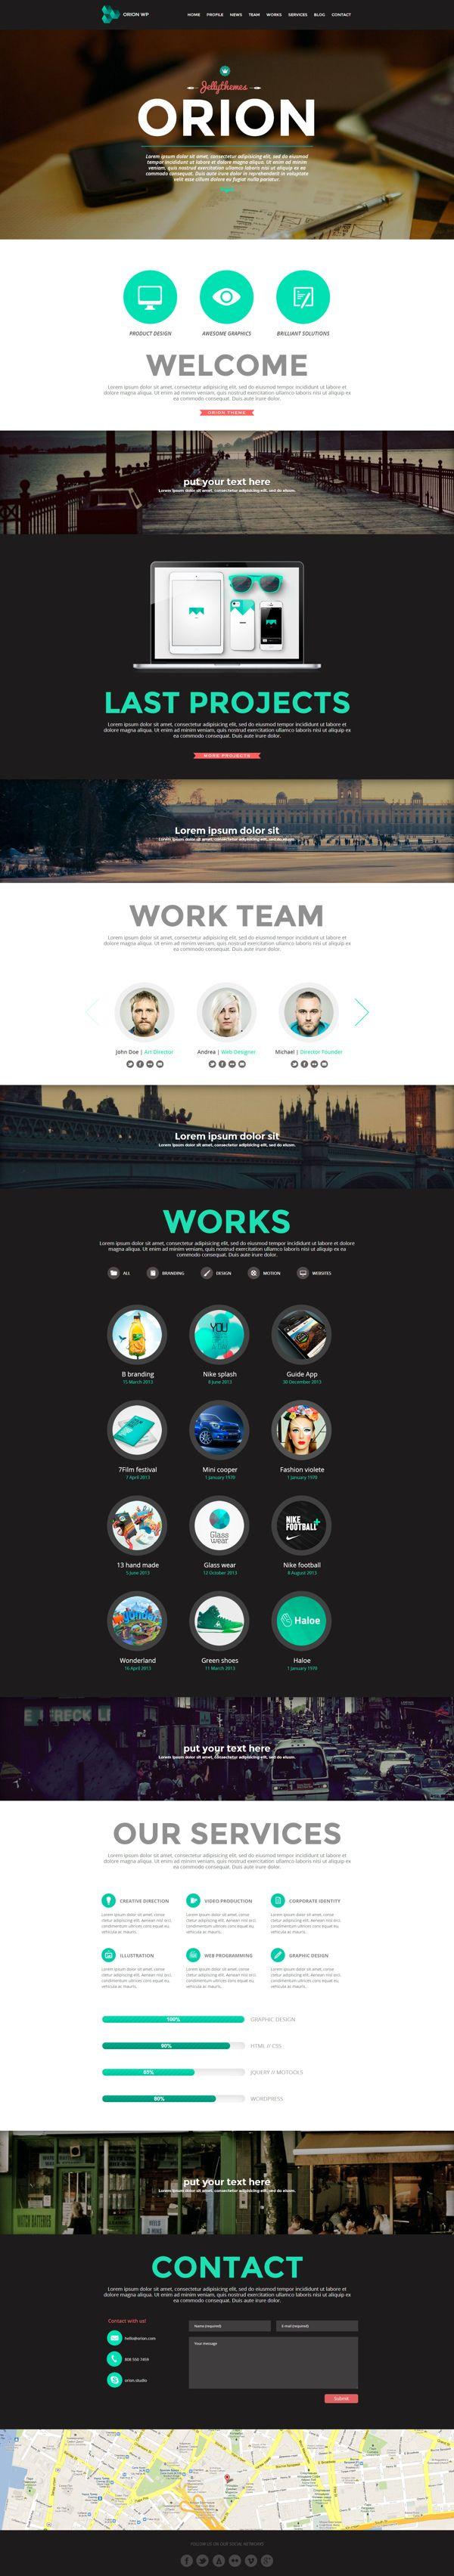 Orion - Responsive One Page Wordpress Template by Zizaza - design ocean , via Behance